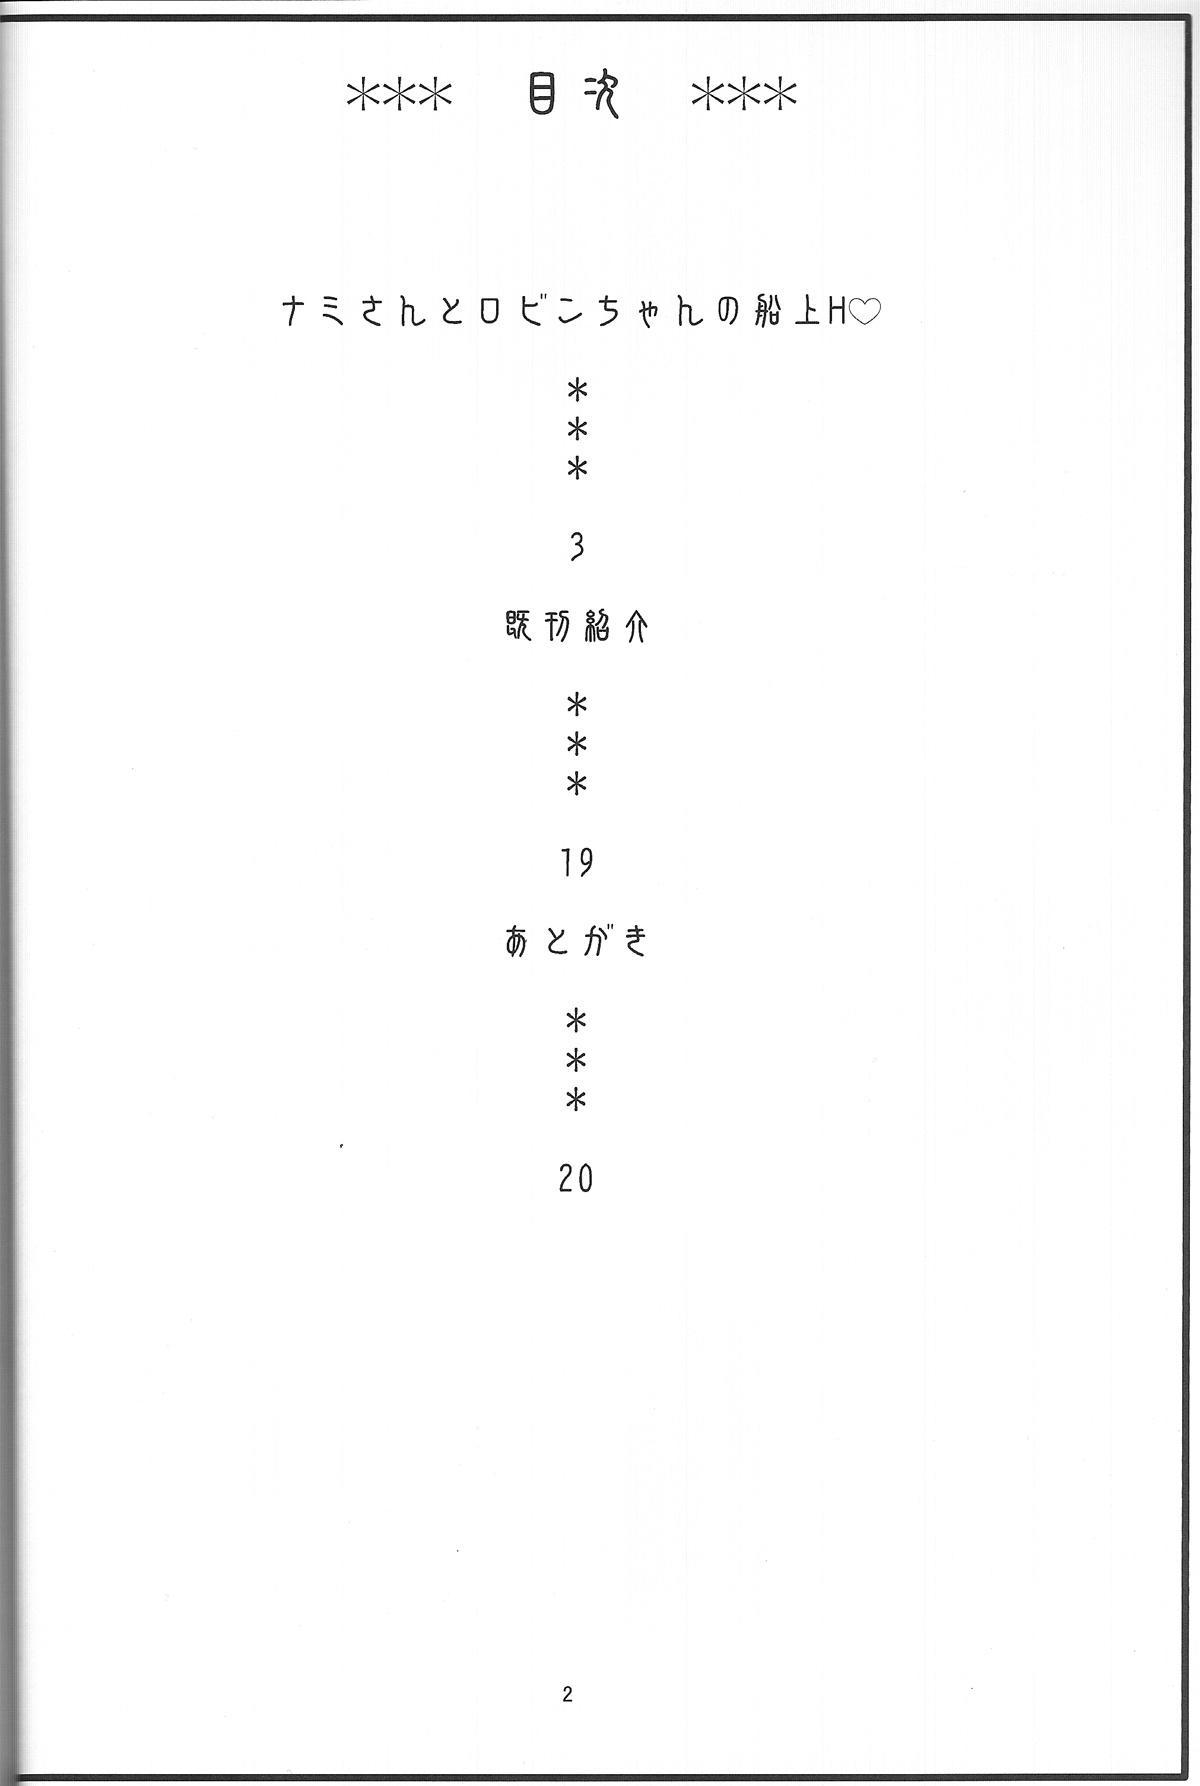 NamiRobi 7 2